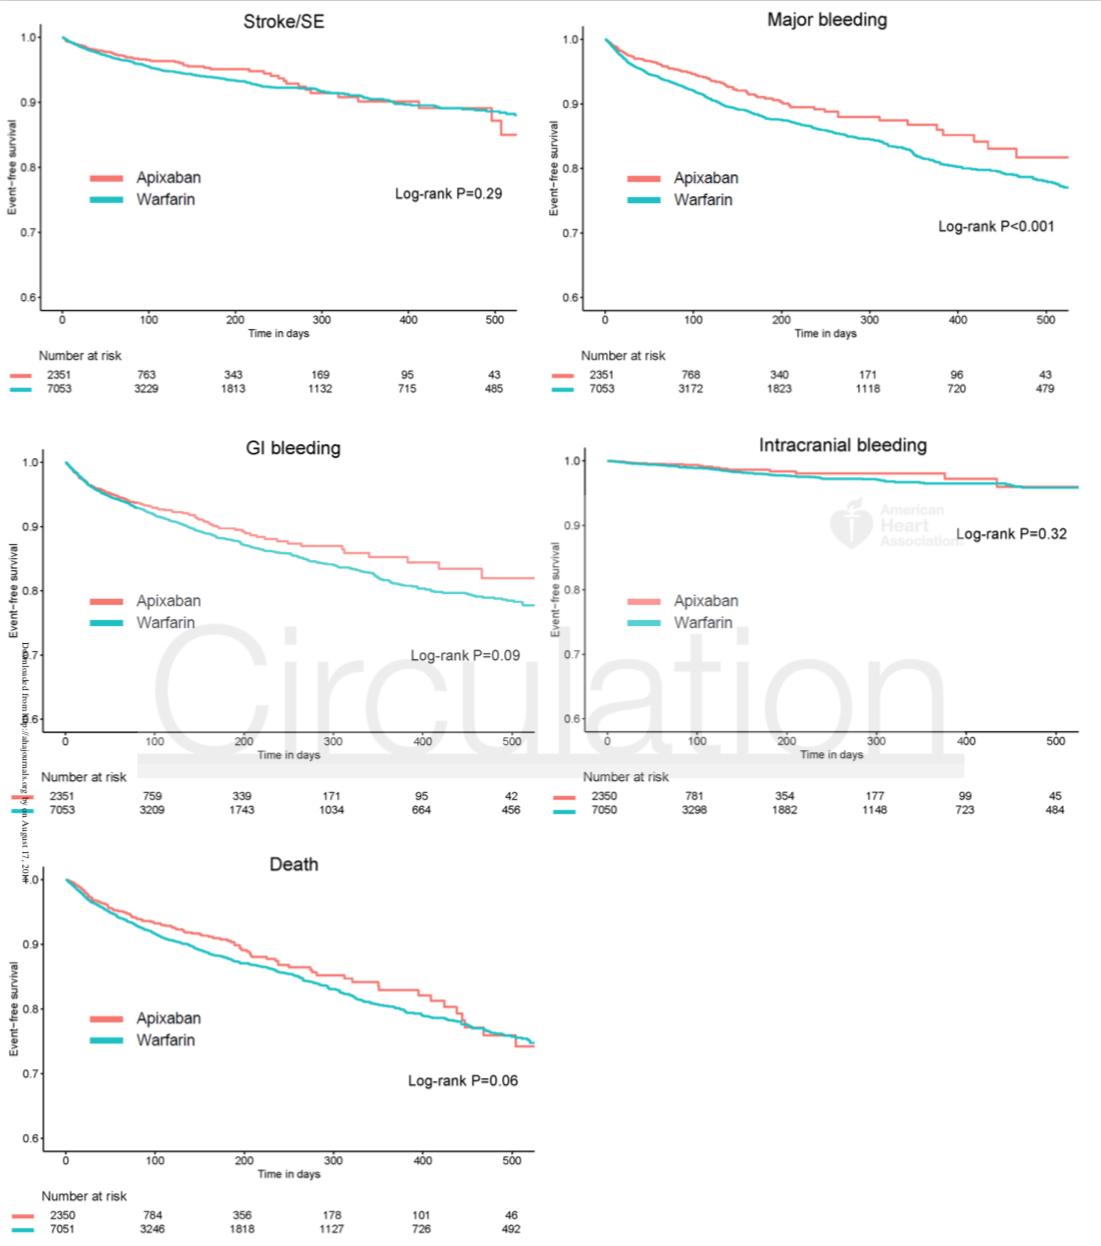 Figure 2: Kaplan-Meier survival curves for the apixaban group and a prognostic-score matched warfarin cohort for stroke/SE, major bleeding, GI bleeding, intracranial bleeding and death.